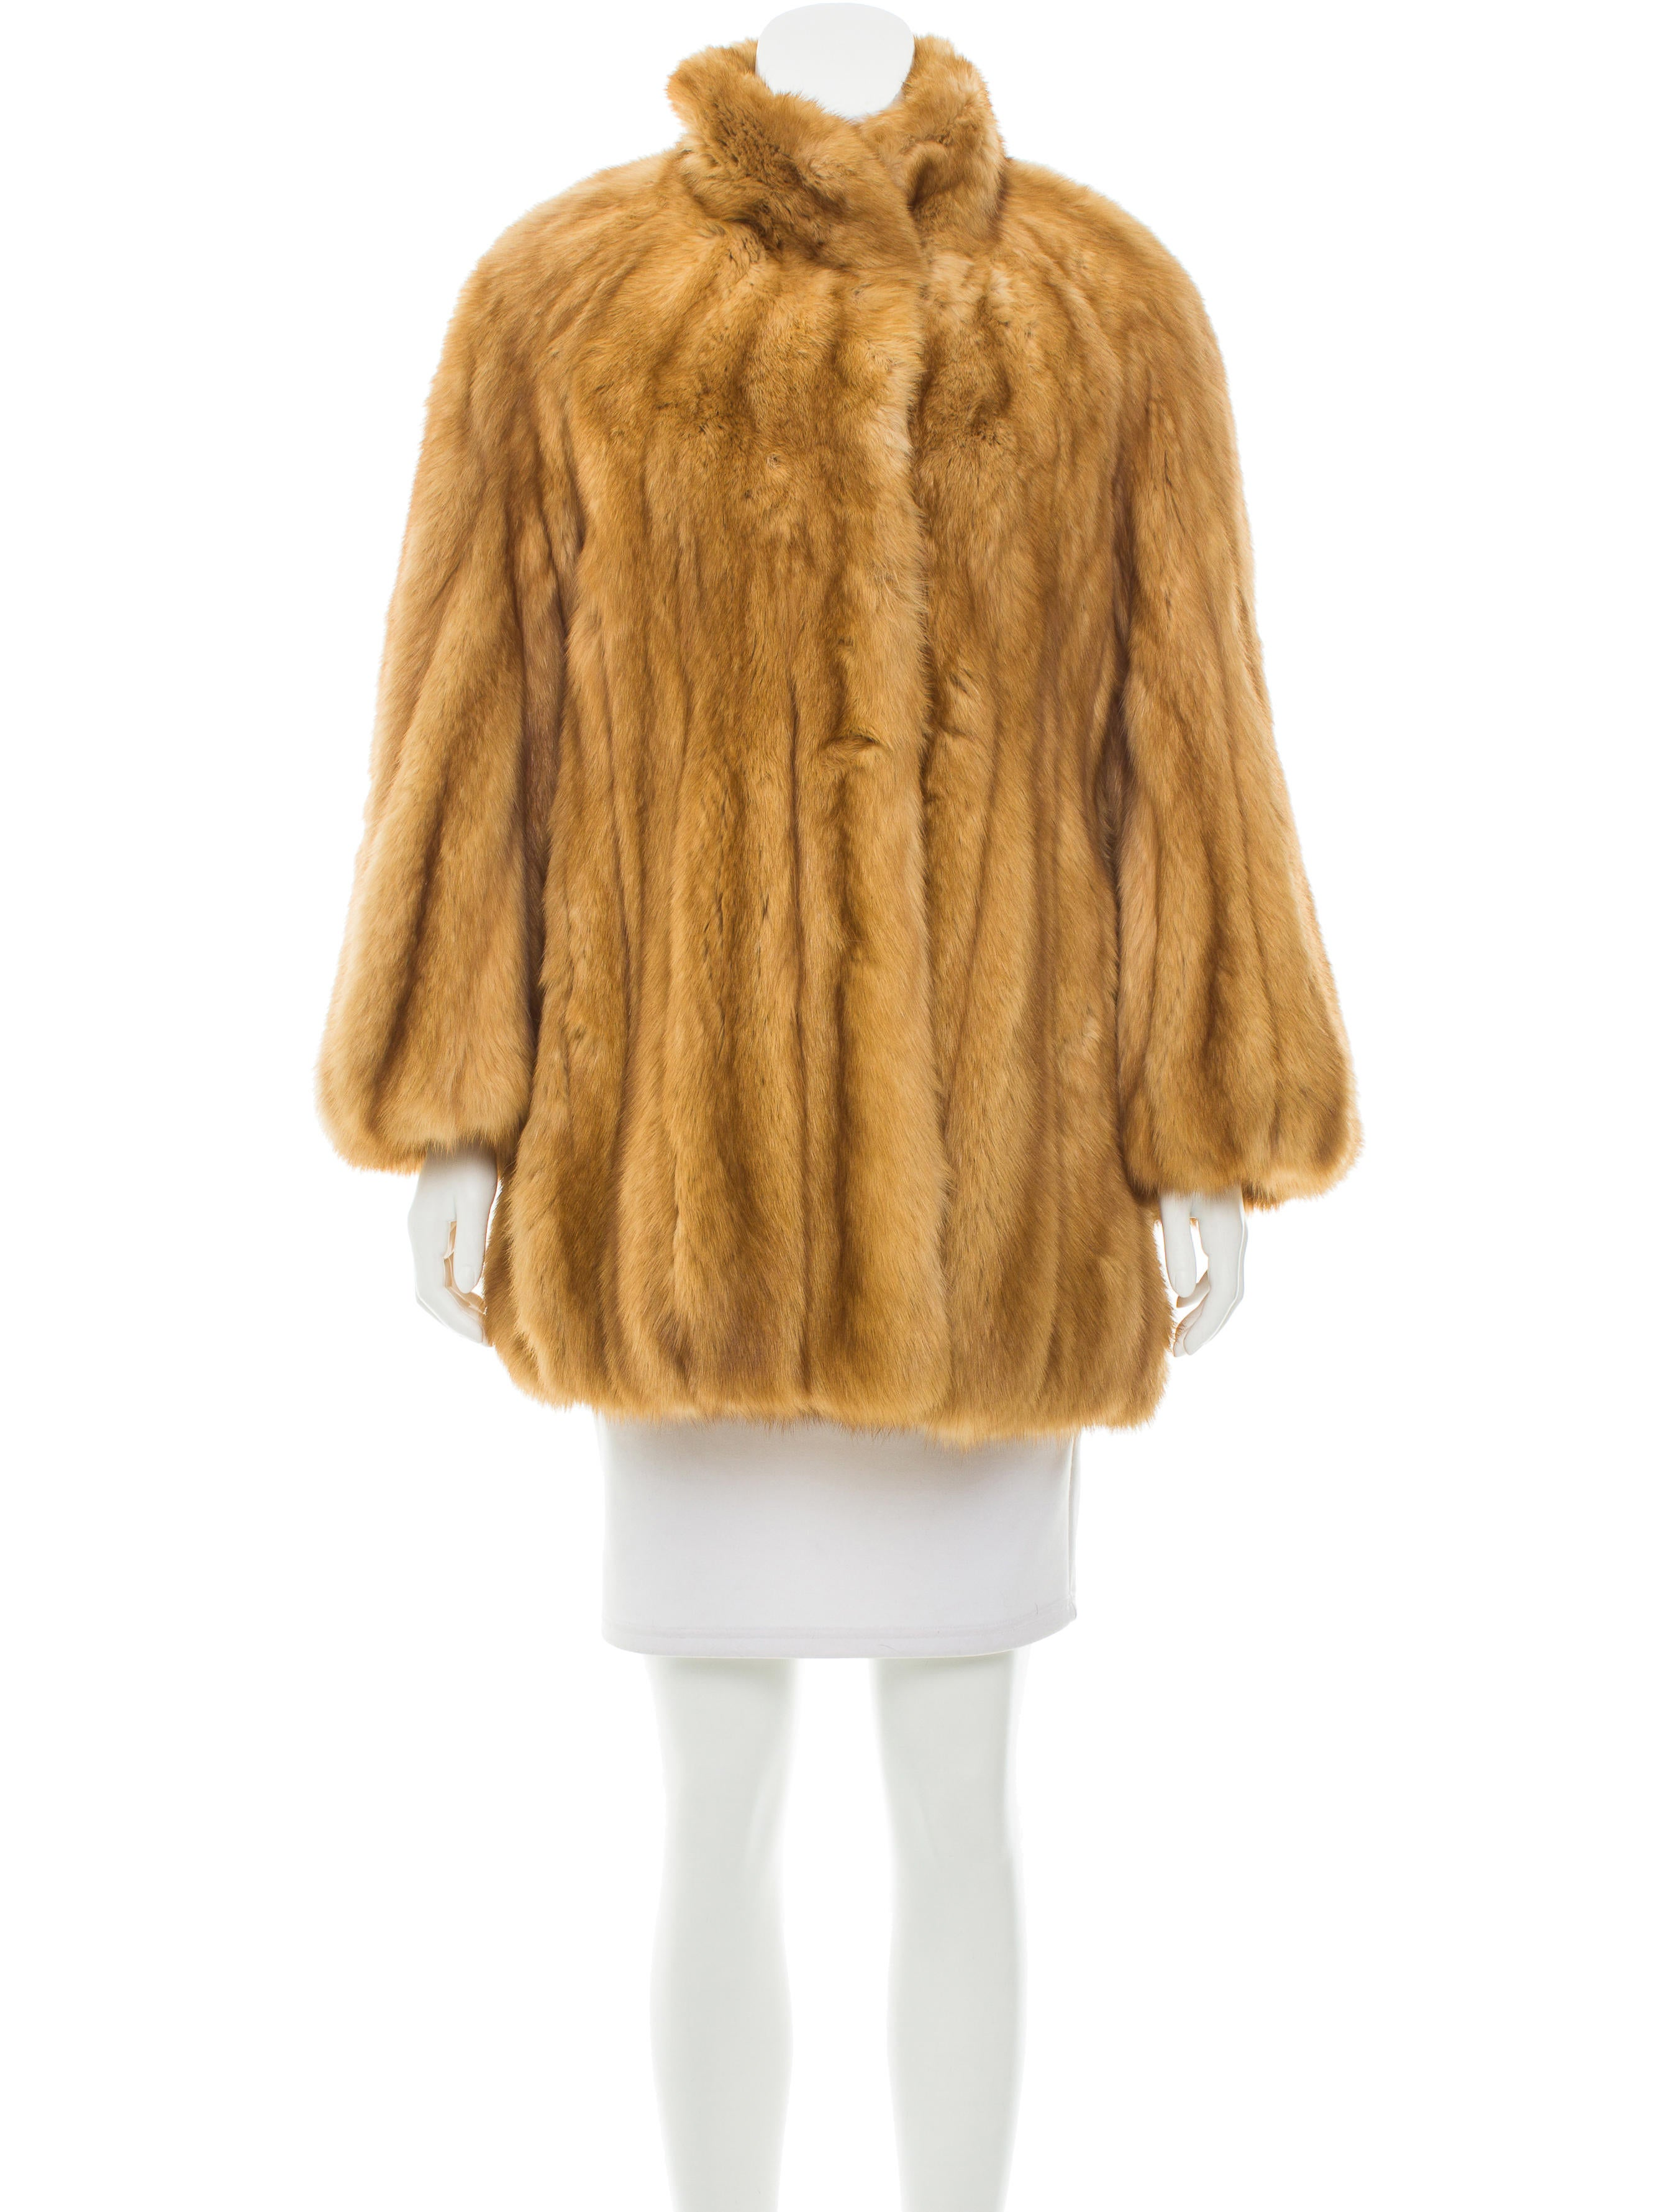 neiman marcus structured fur coat clothing nemrc20374. Black Bedroom Furniture Sets. Home Design Ideas